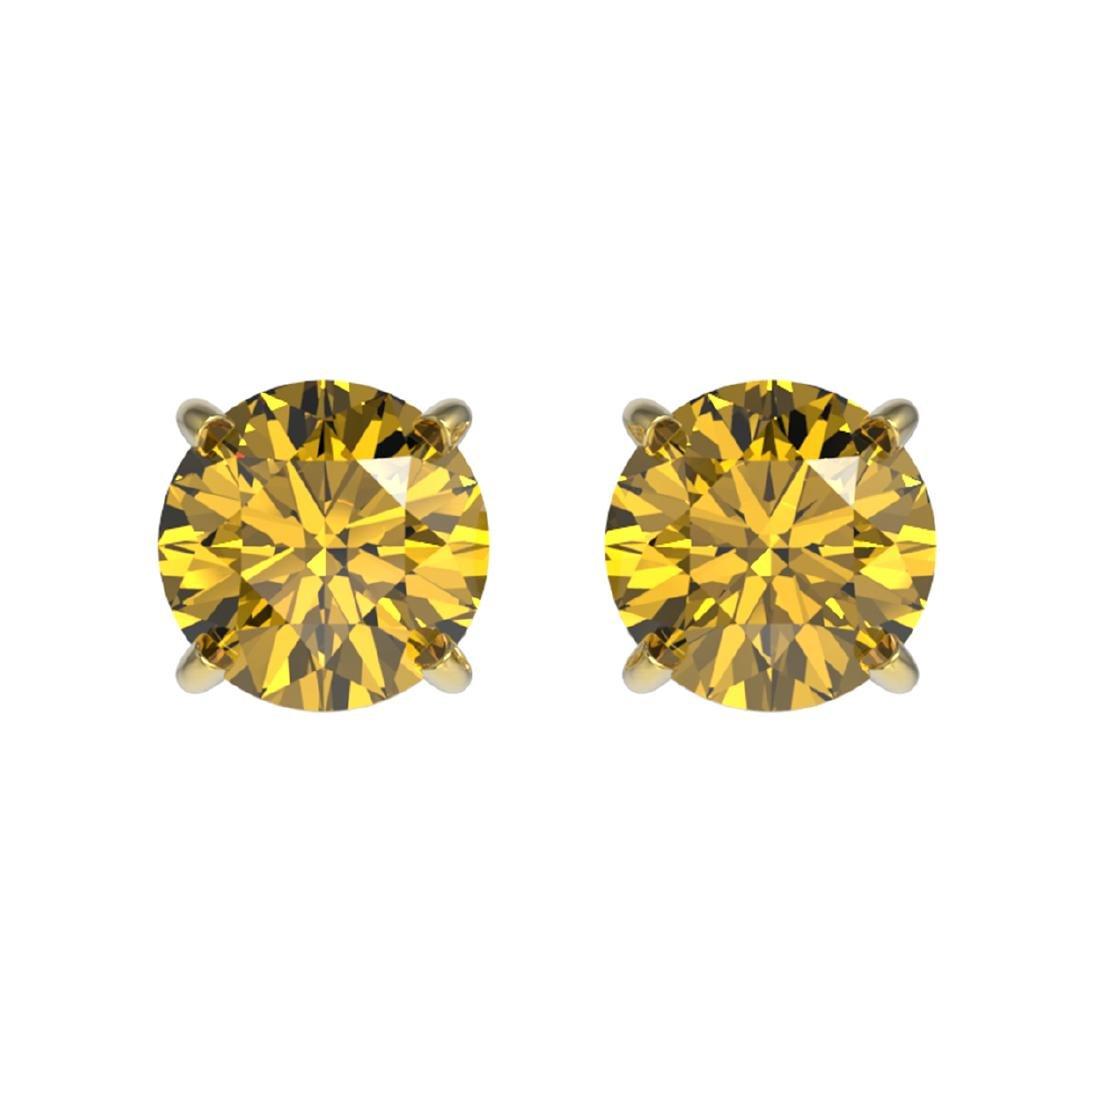 1 ctw Intense Yellow Diamond Stud Earrings 10K Yellow